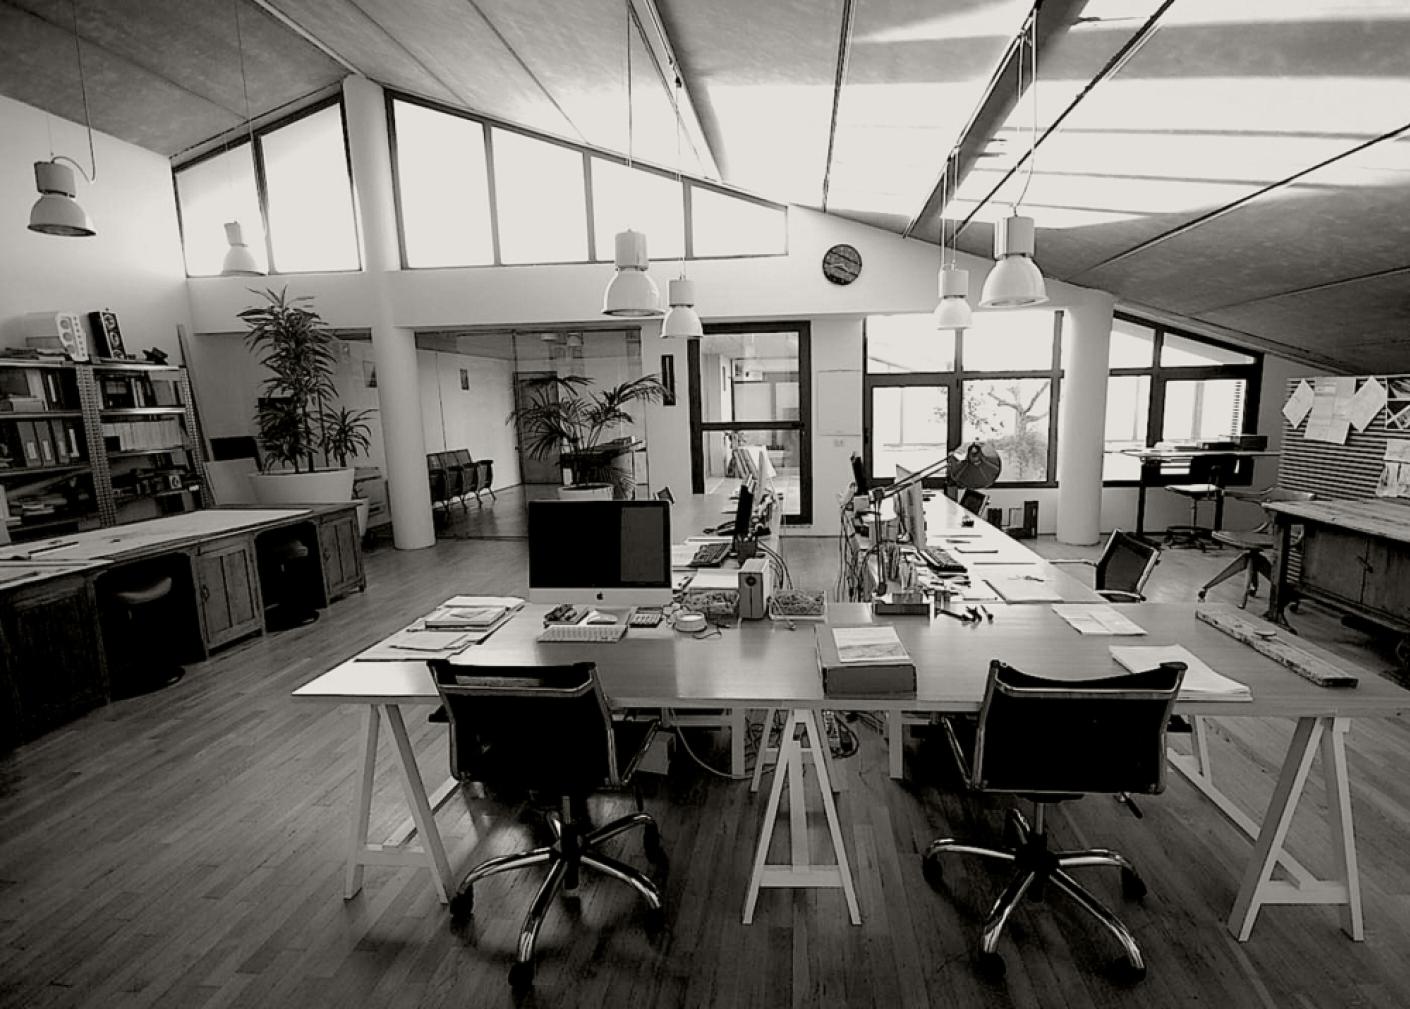 Studio di architettura a sassari officina29 architetti for Studio architettura catania